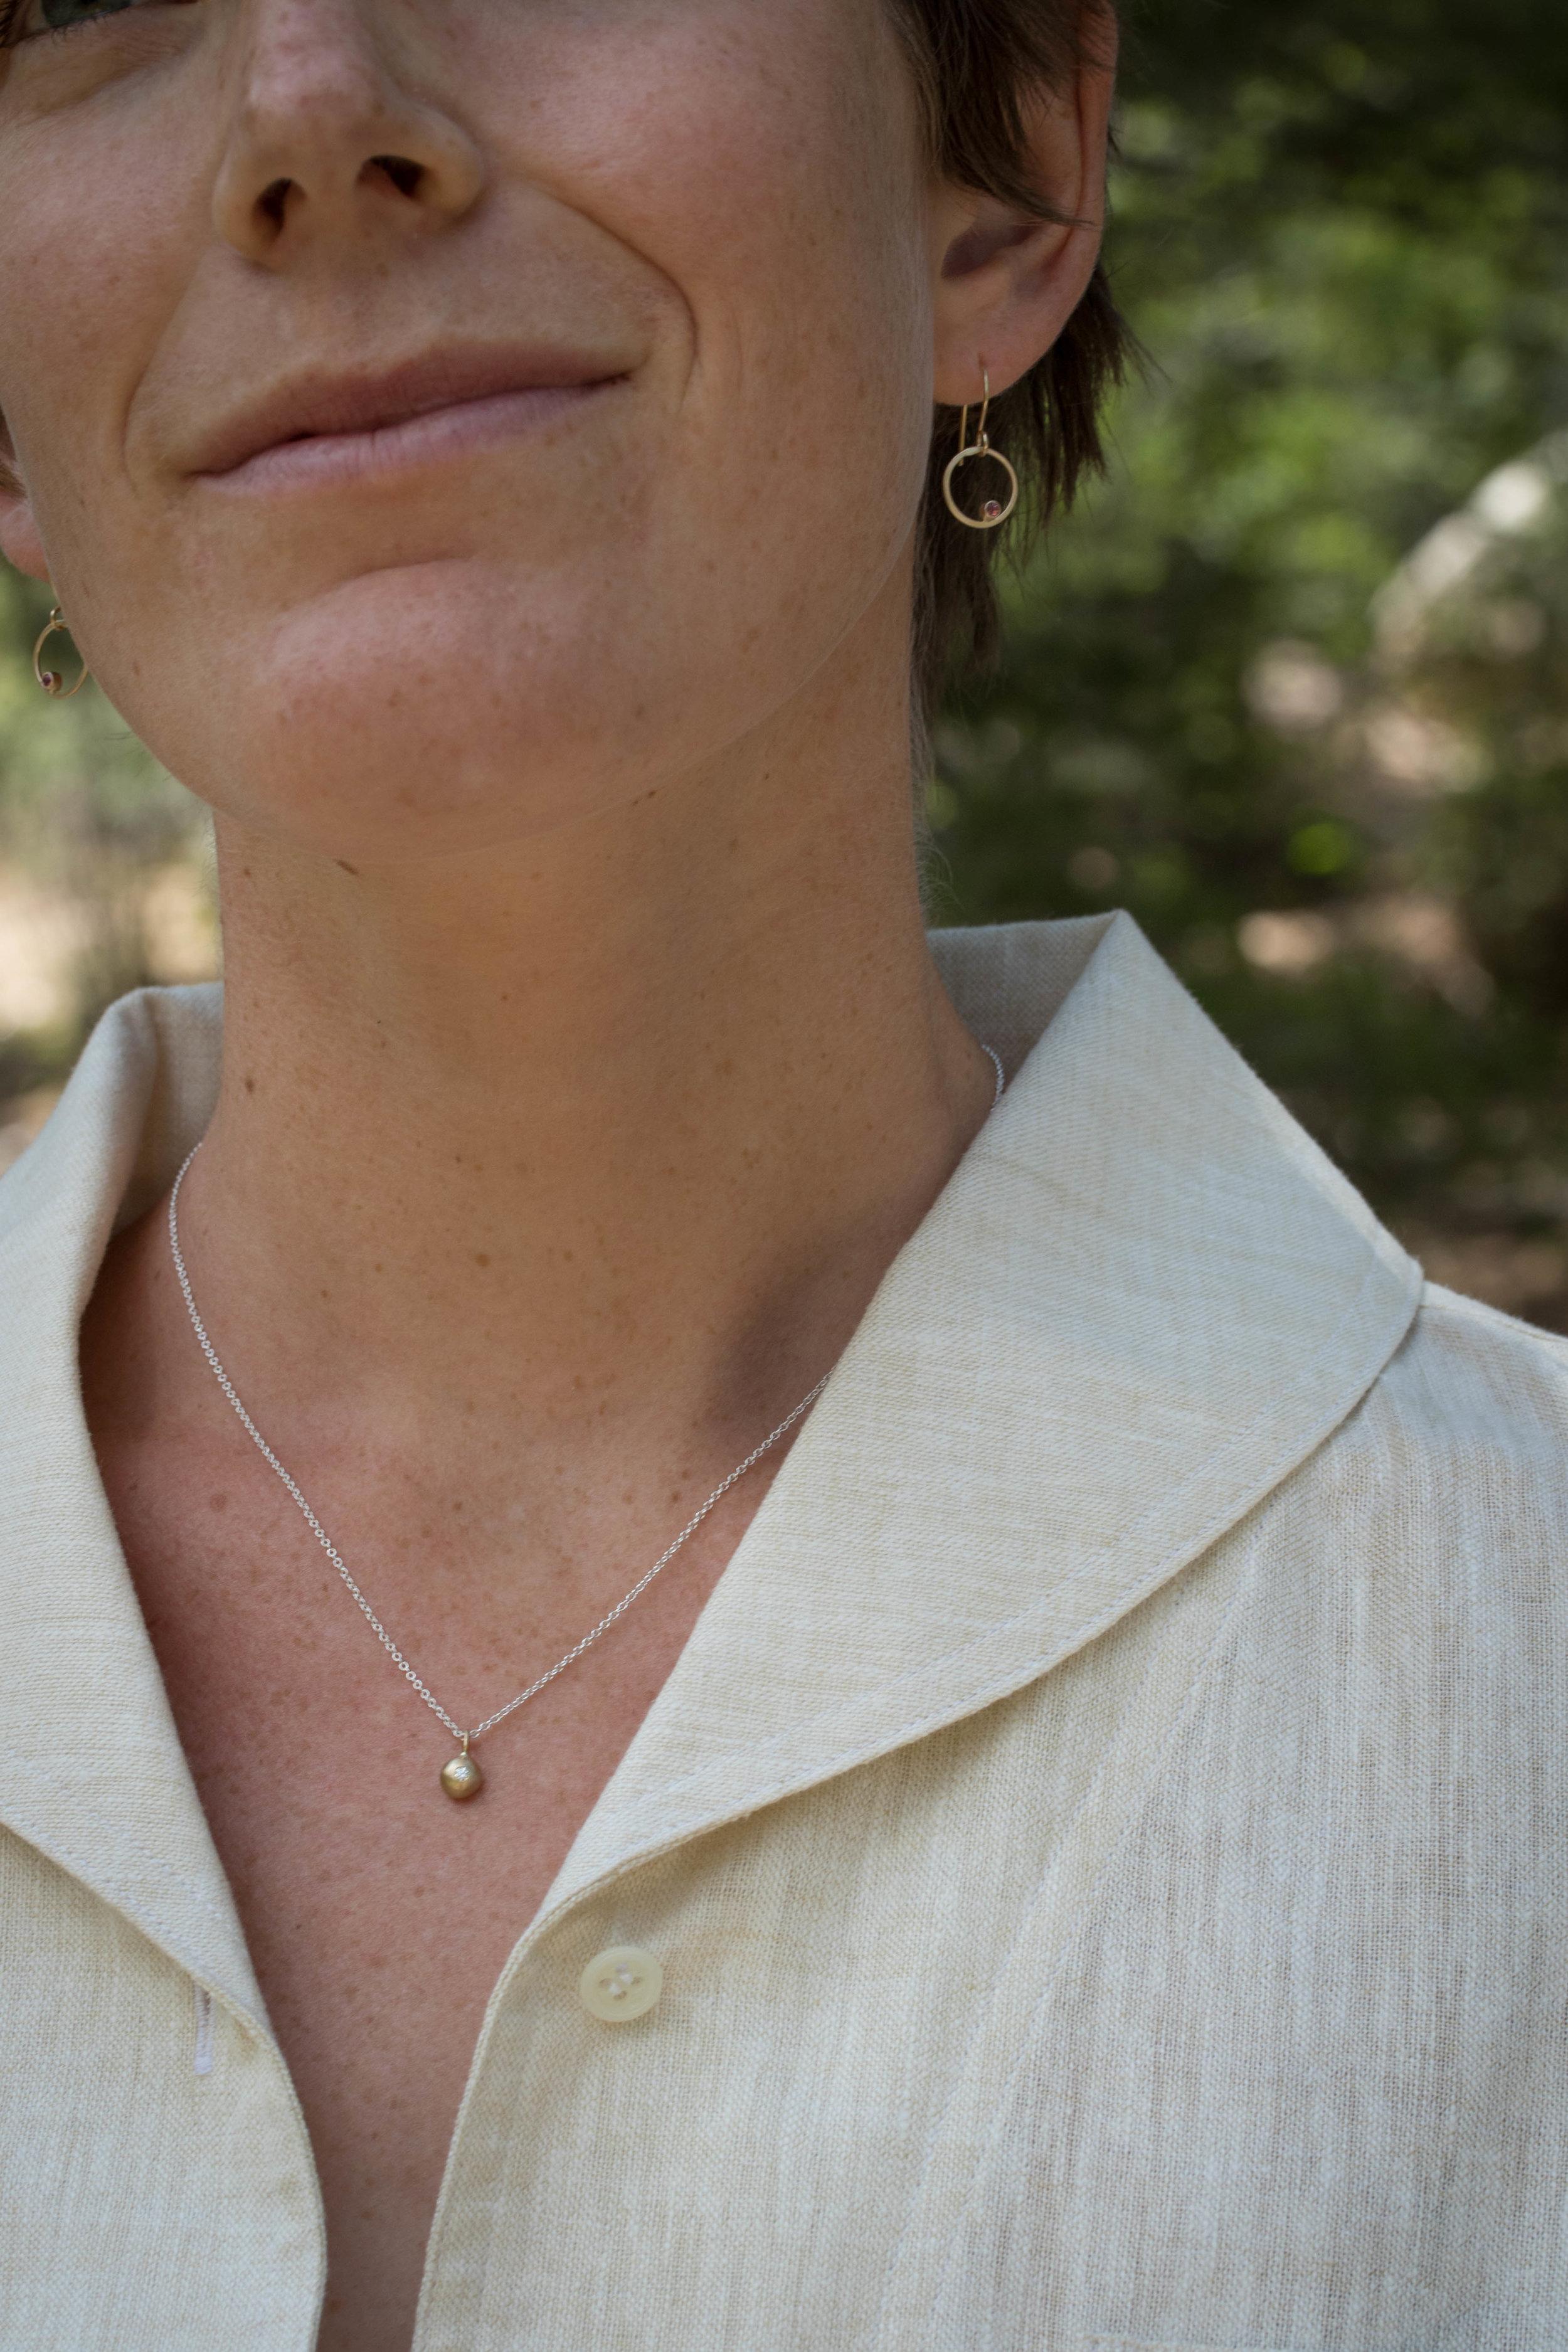 RMG Circe Ruby earrings and Diamond Orb necklace on Sonia.jpg